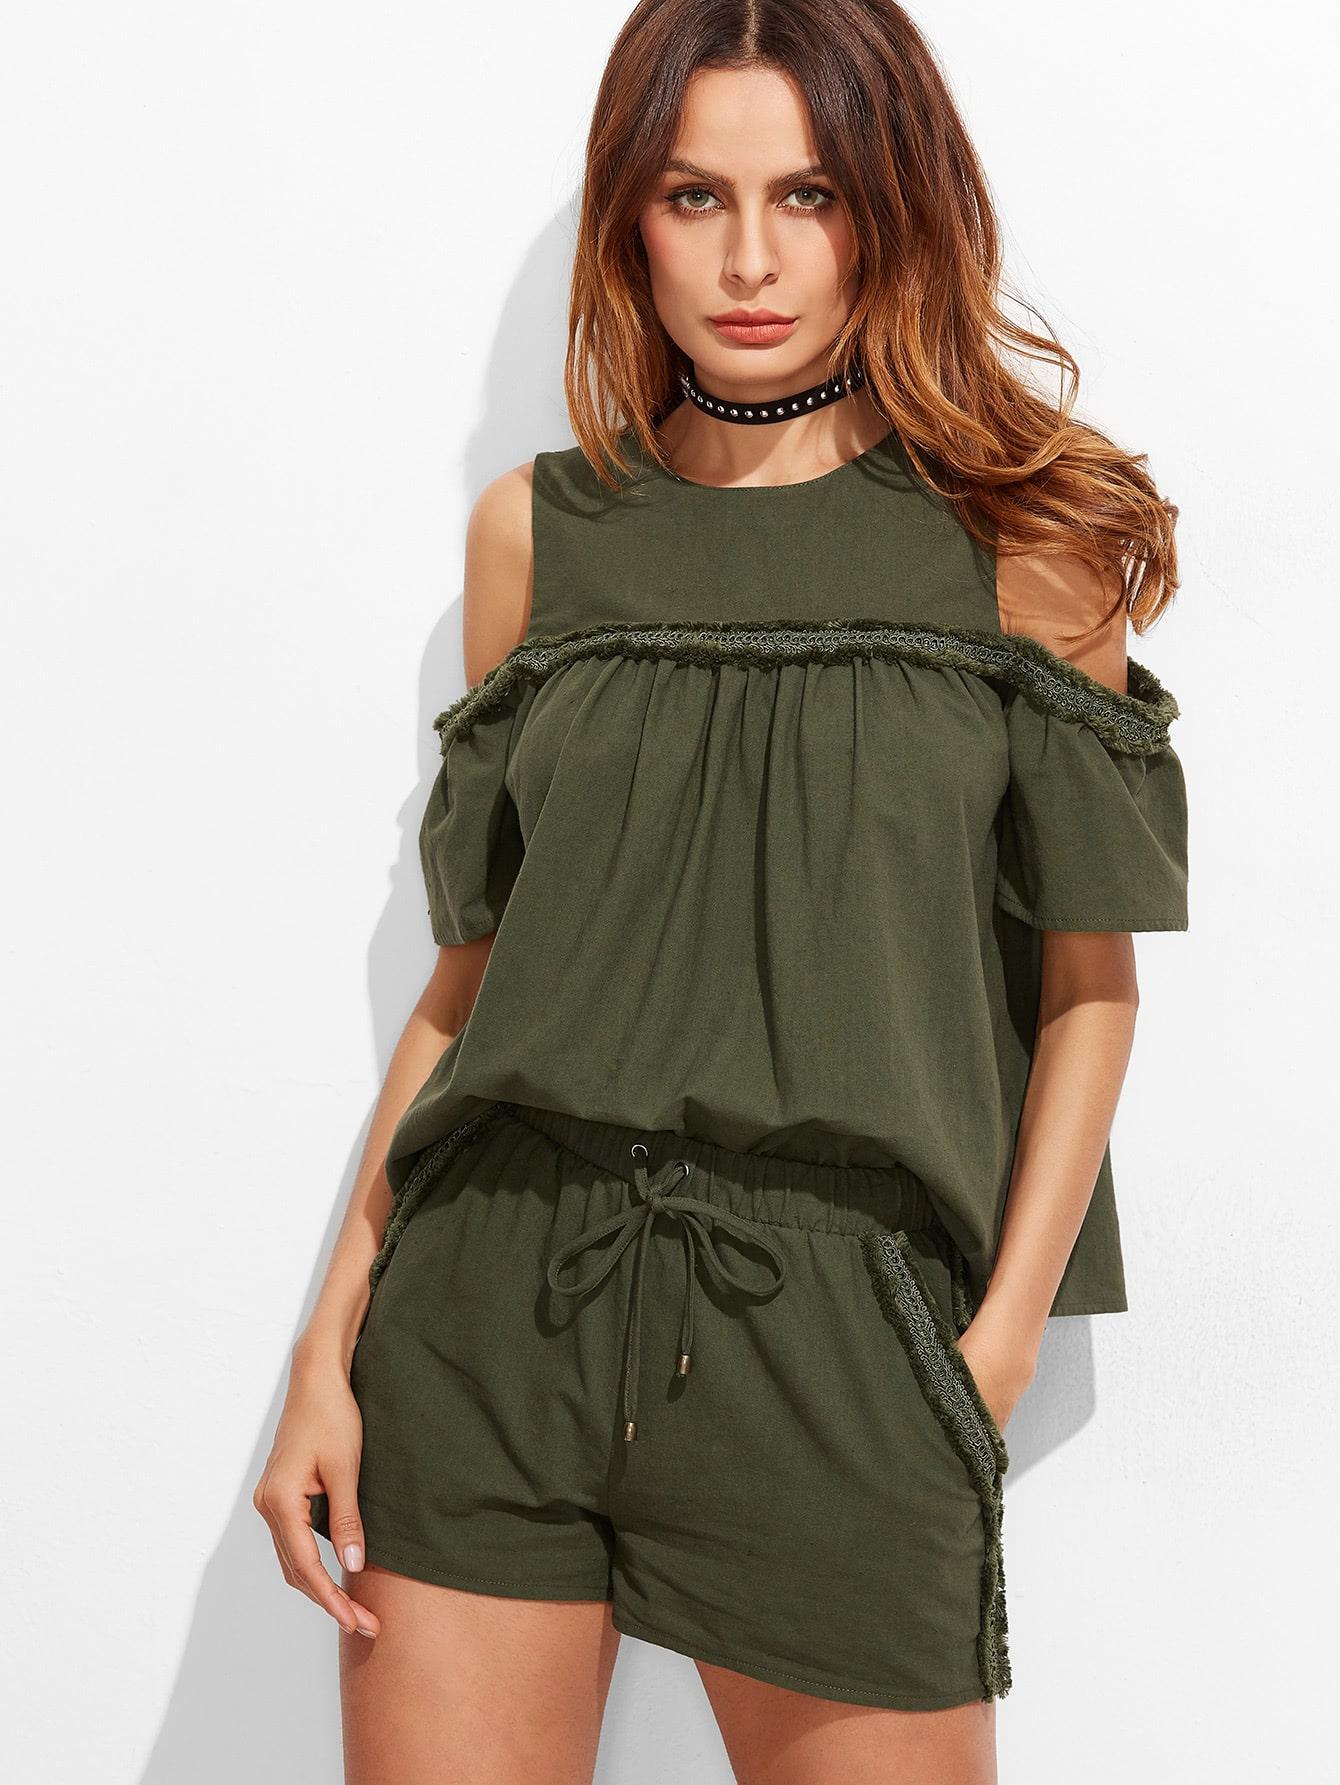 blouse161207703_2